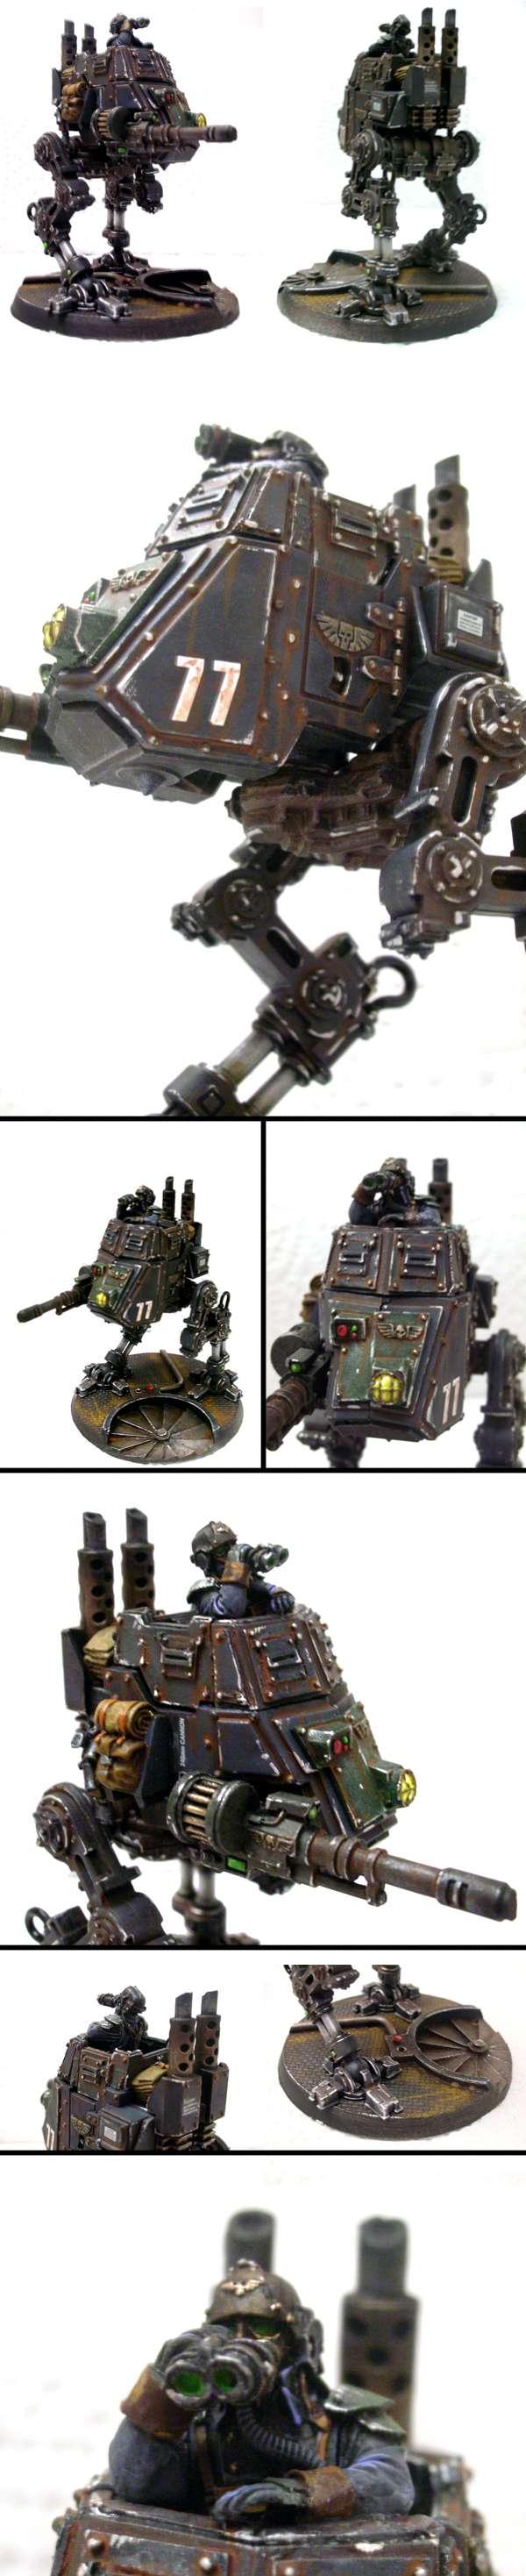 DKK Sentinel